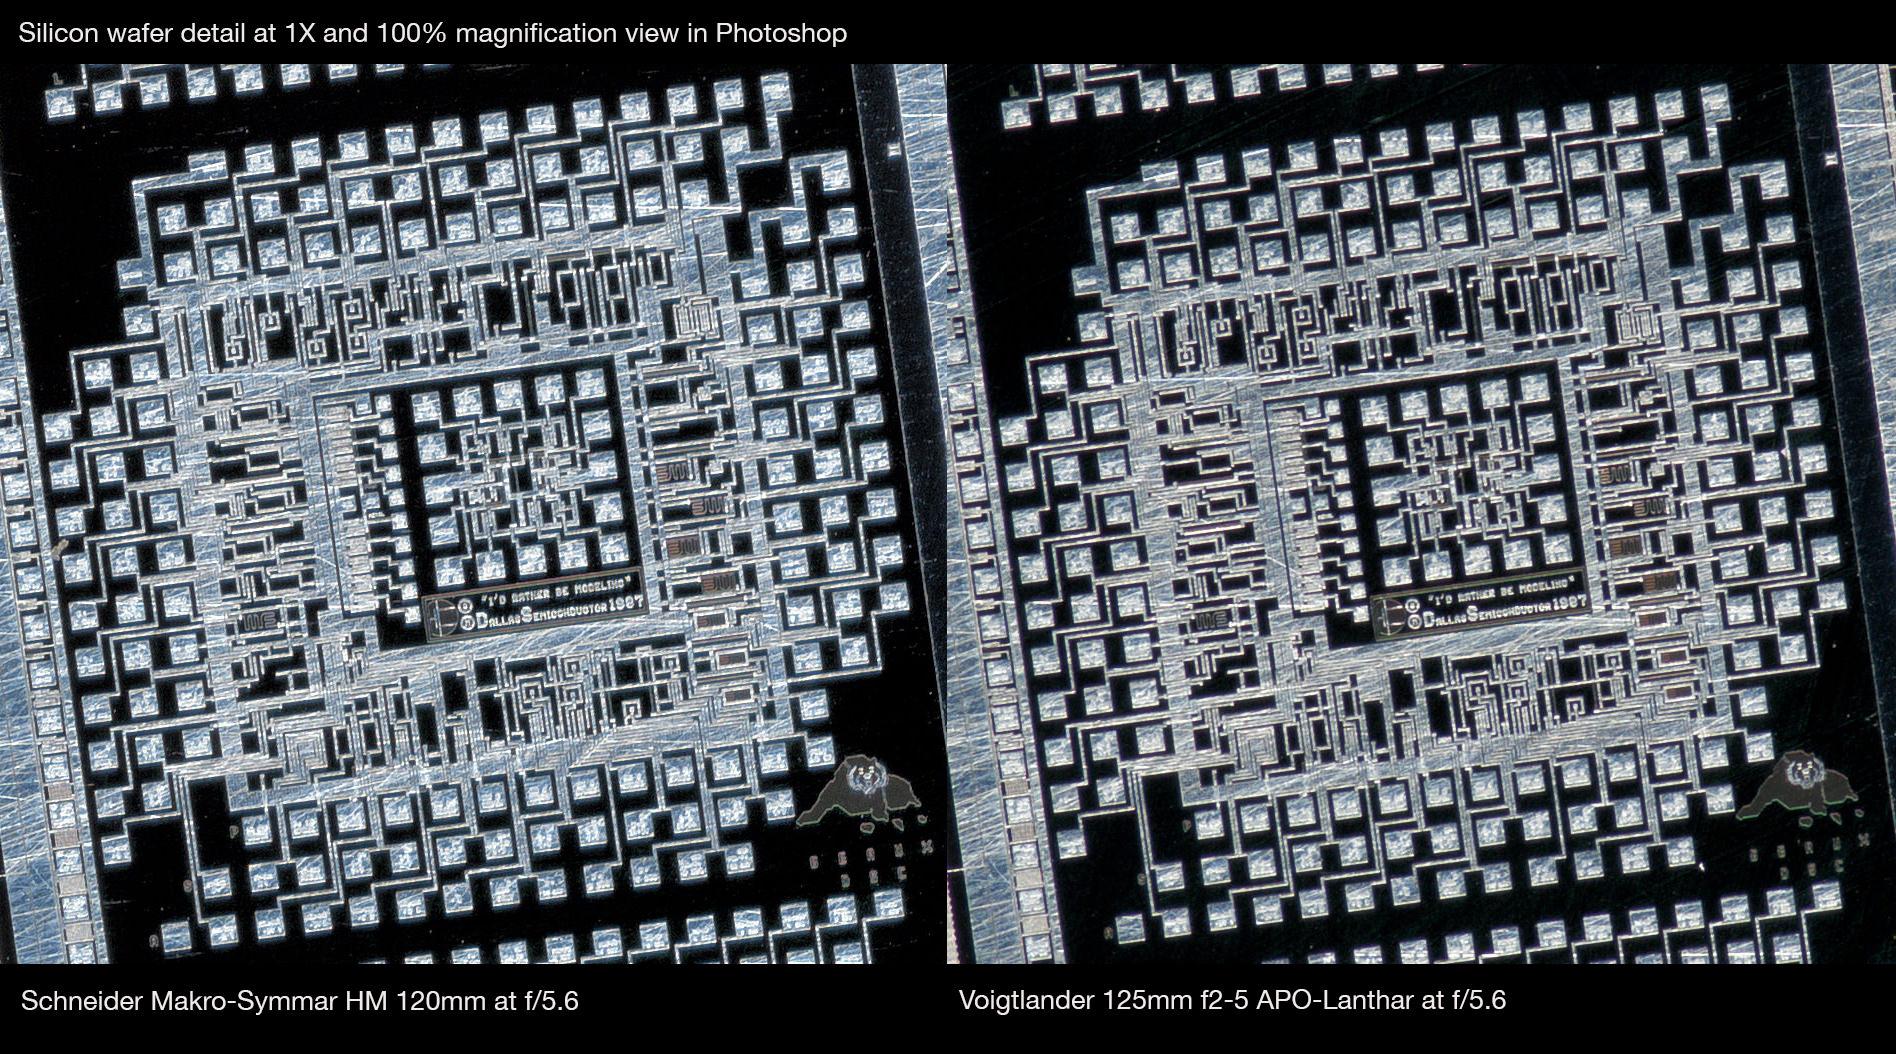 Schneider-Macro-Symmar-HM-120mm-vs-Voigtlander-125mm-APO-Lanthar-at-1X-center-crop-Robert-OToole-Photography.JPG